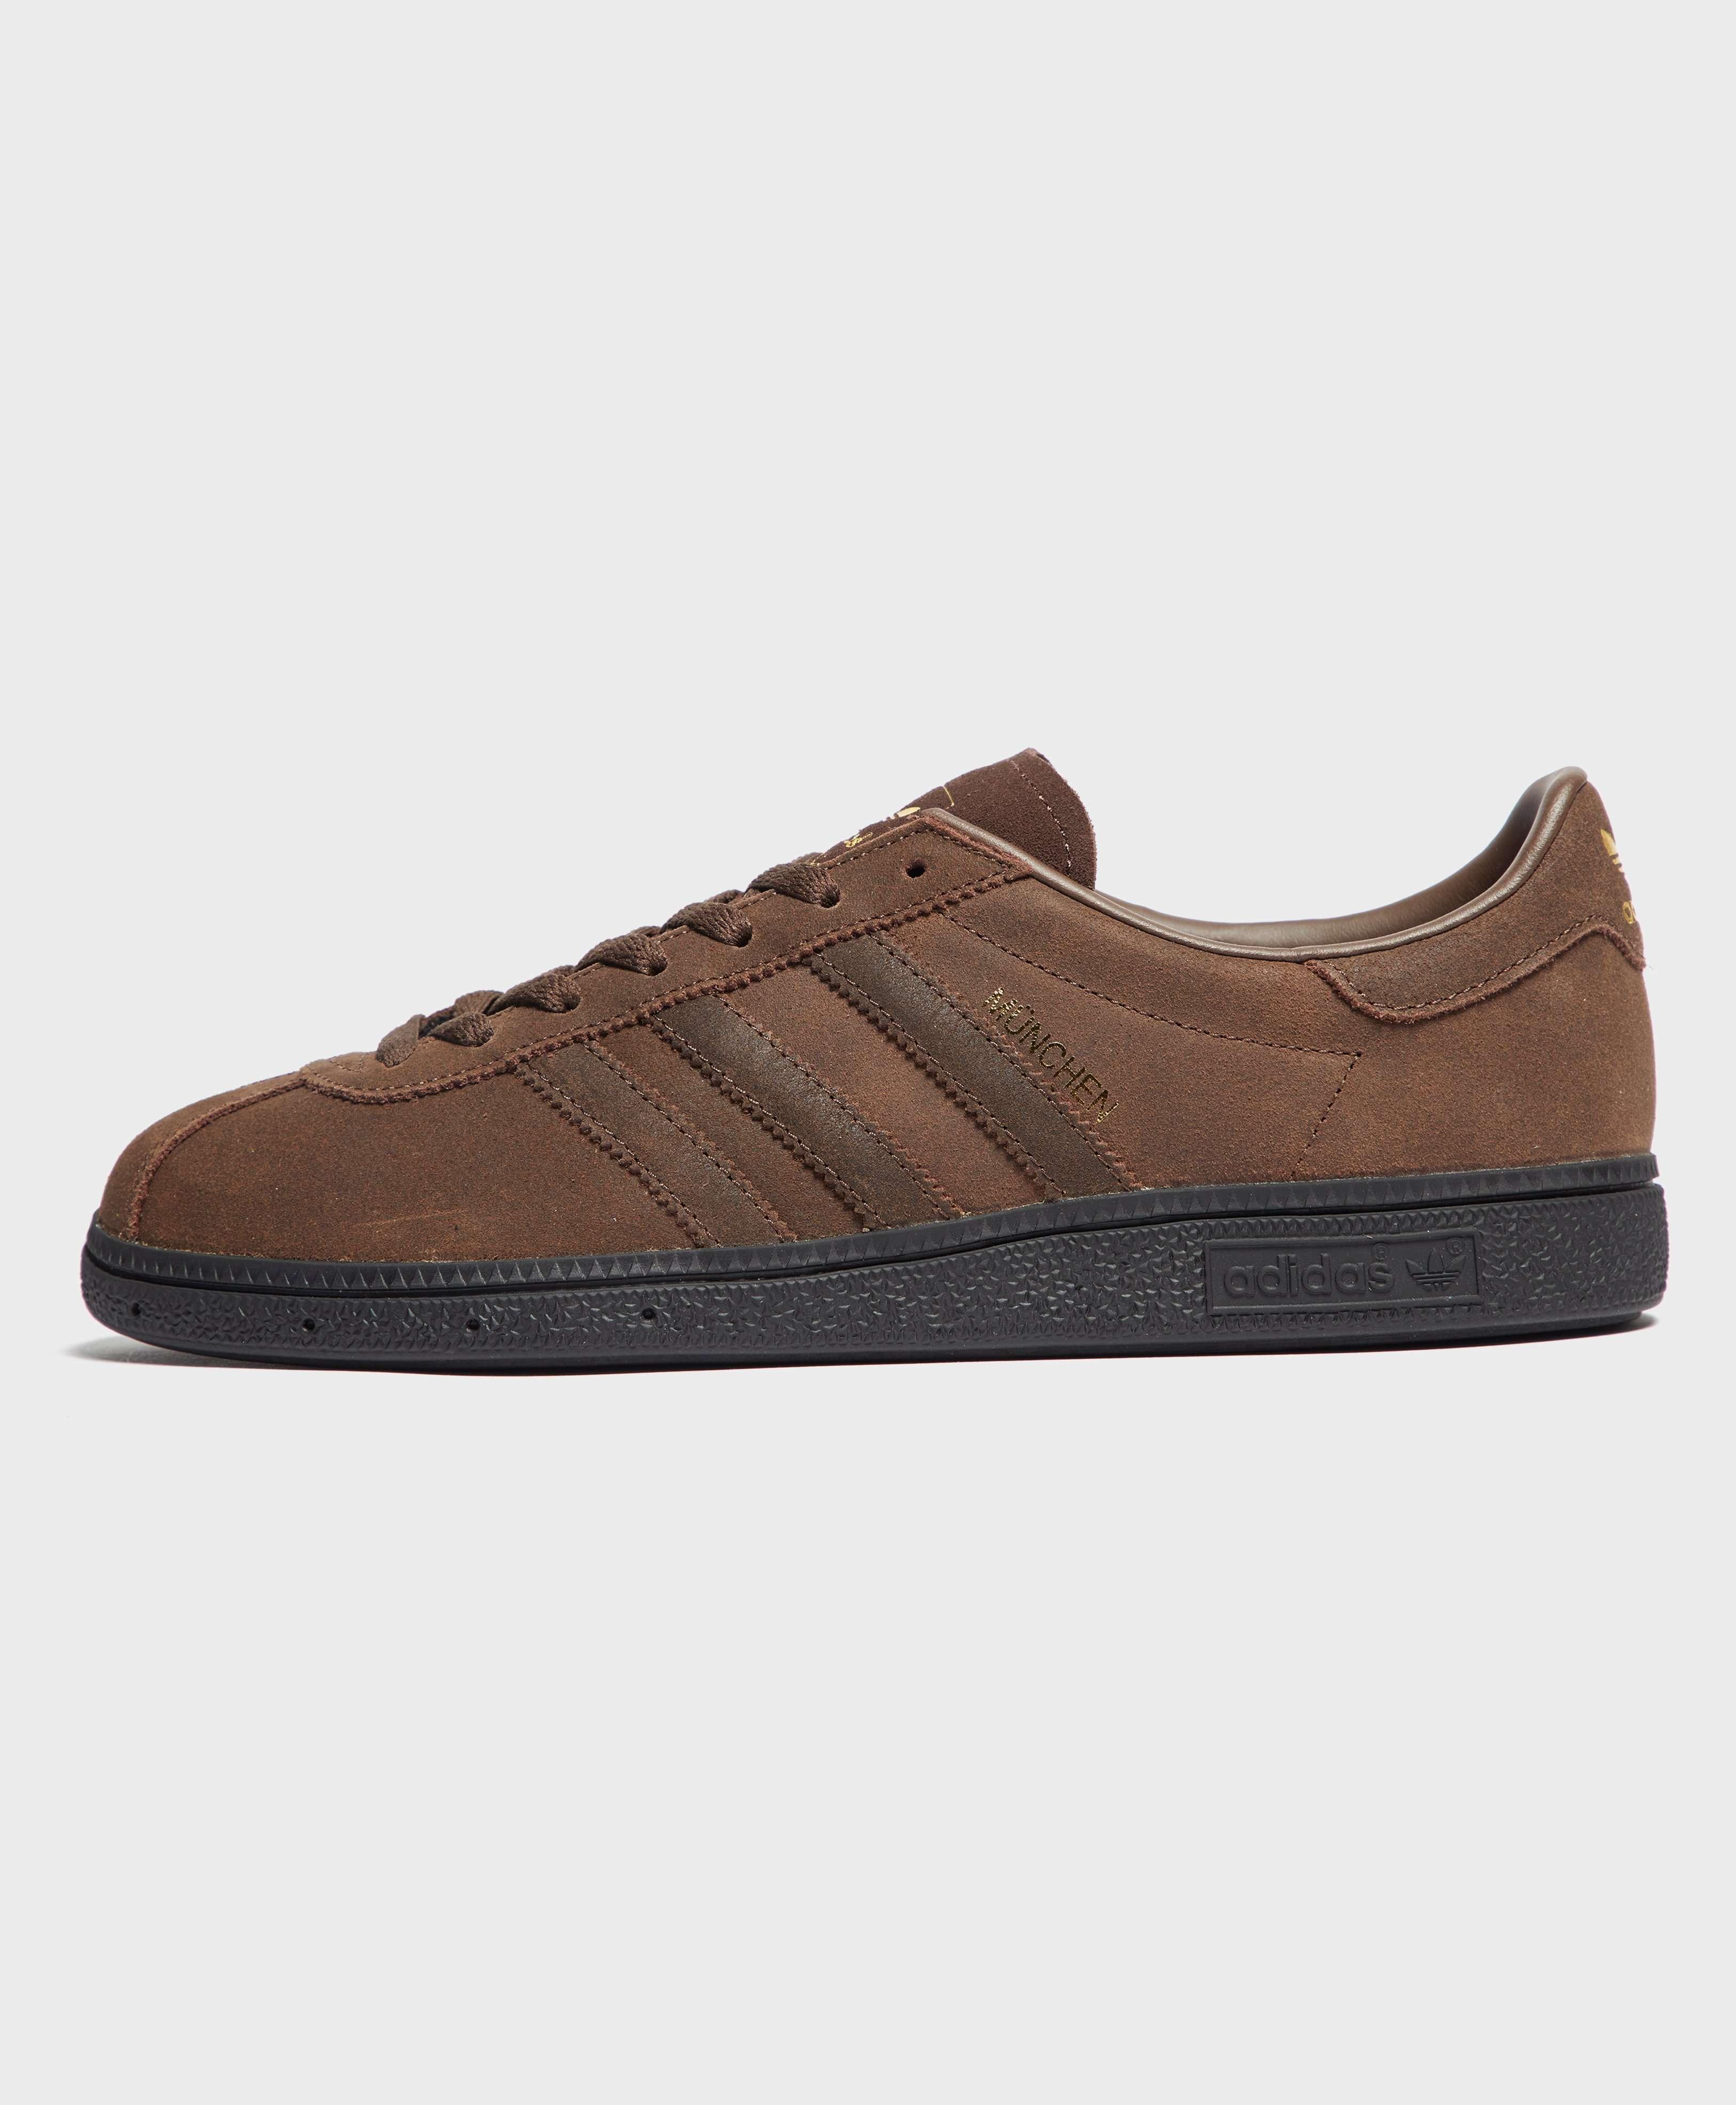 buy online 0a5da 903cb adidas Originals Munchen   scotts Menswear